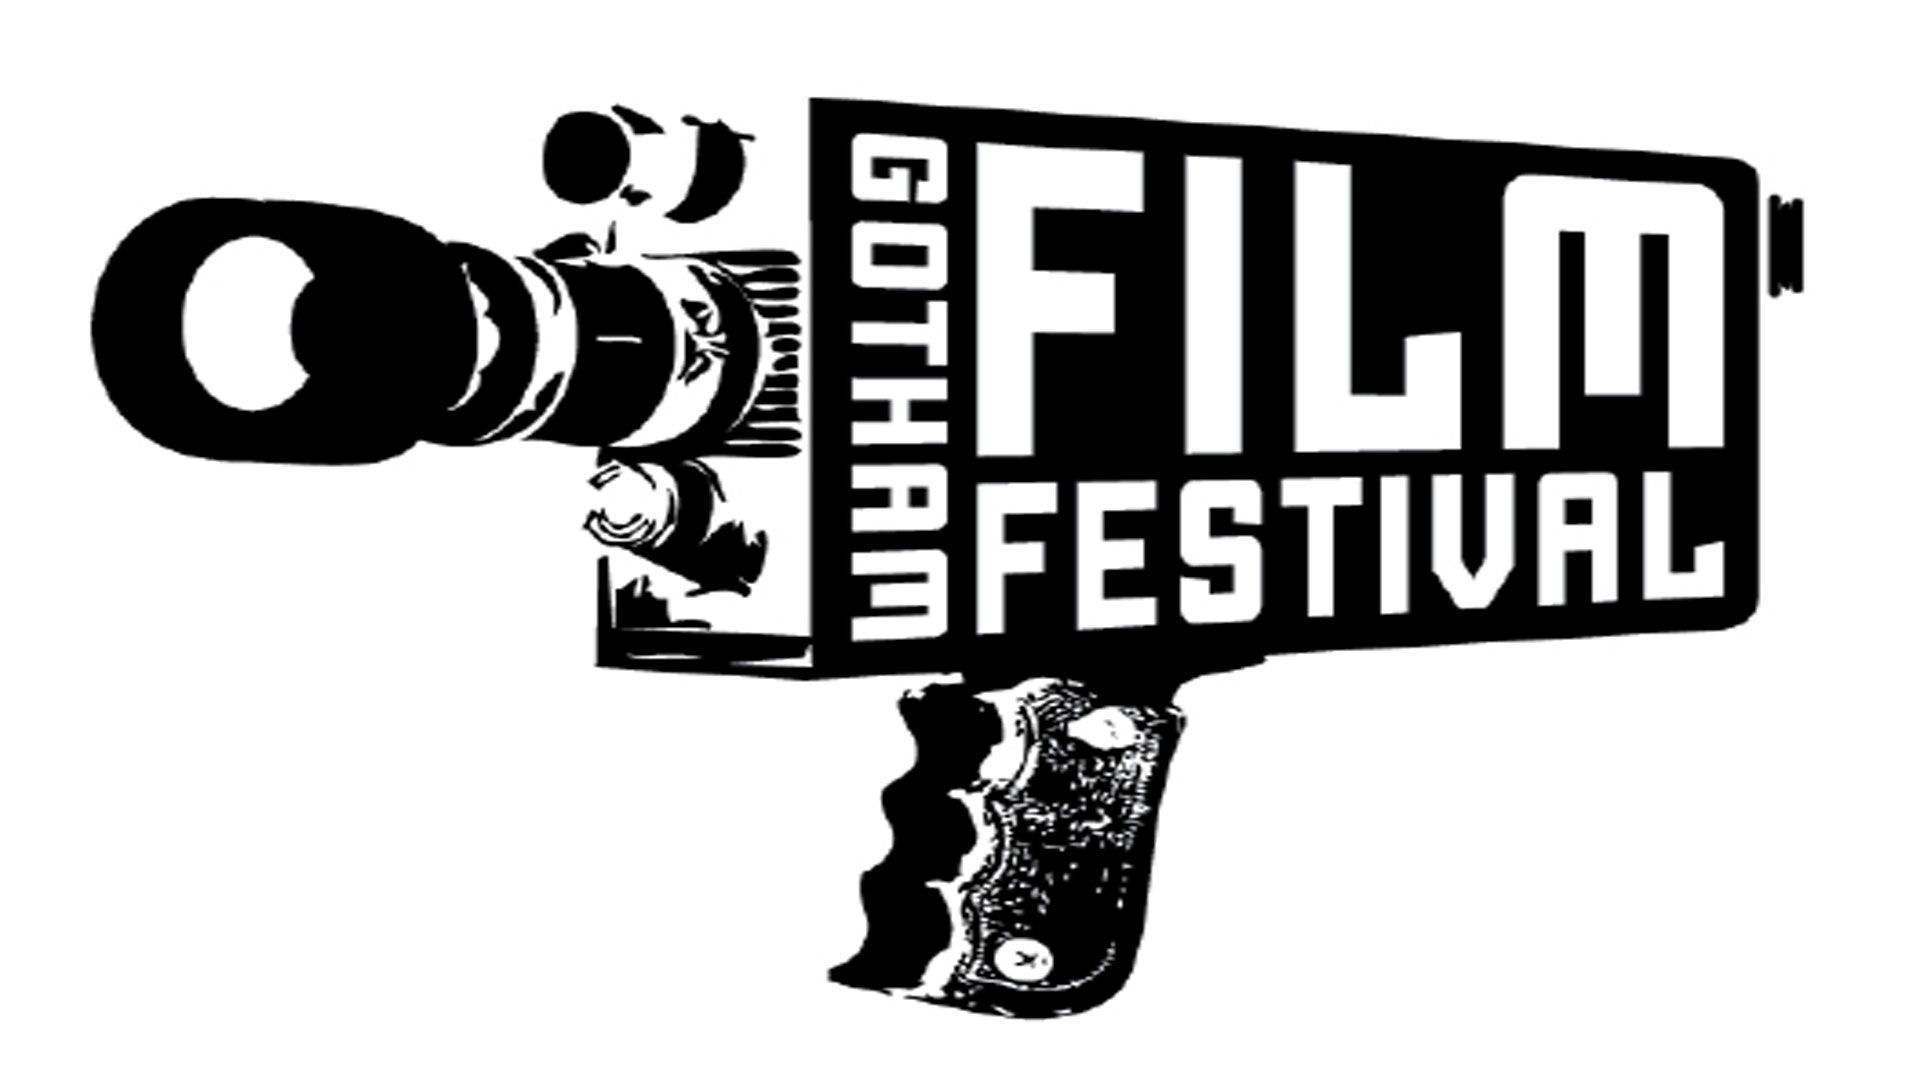 Gotham Film Festival 2014